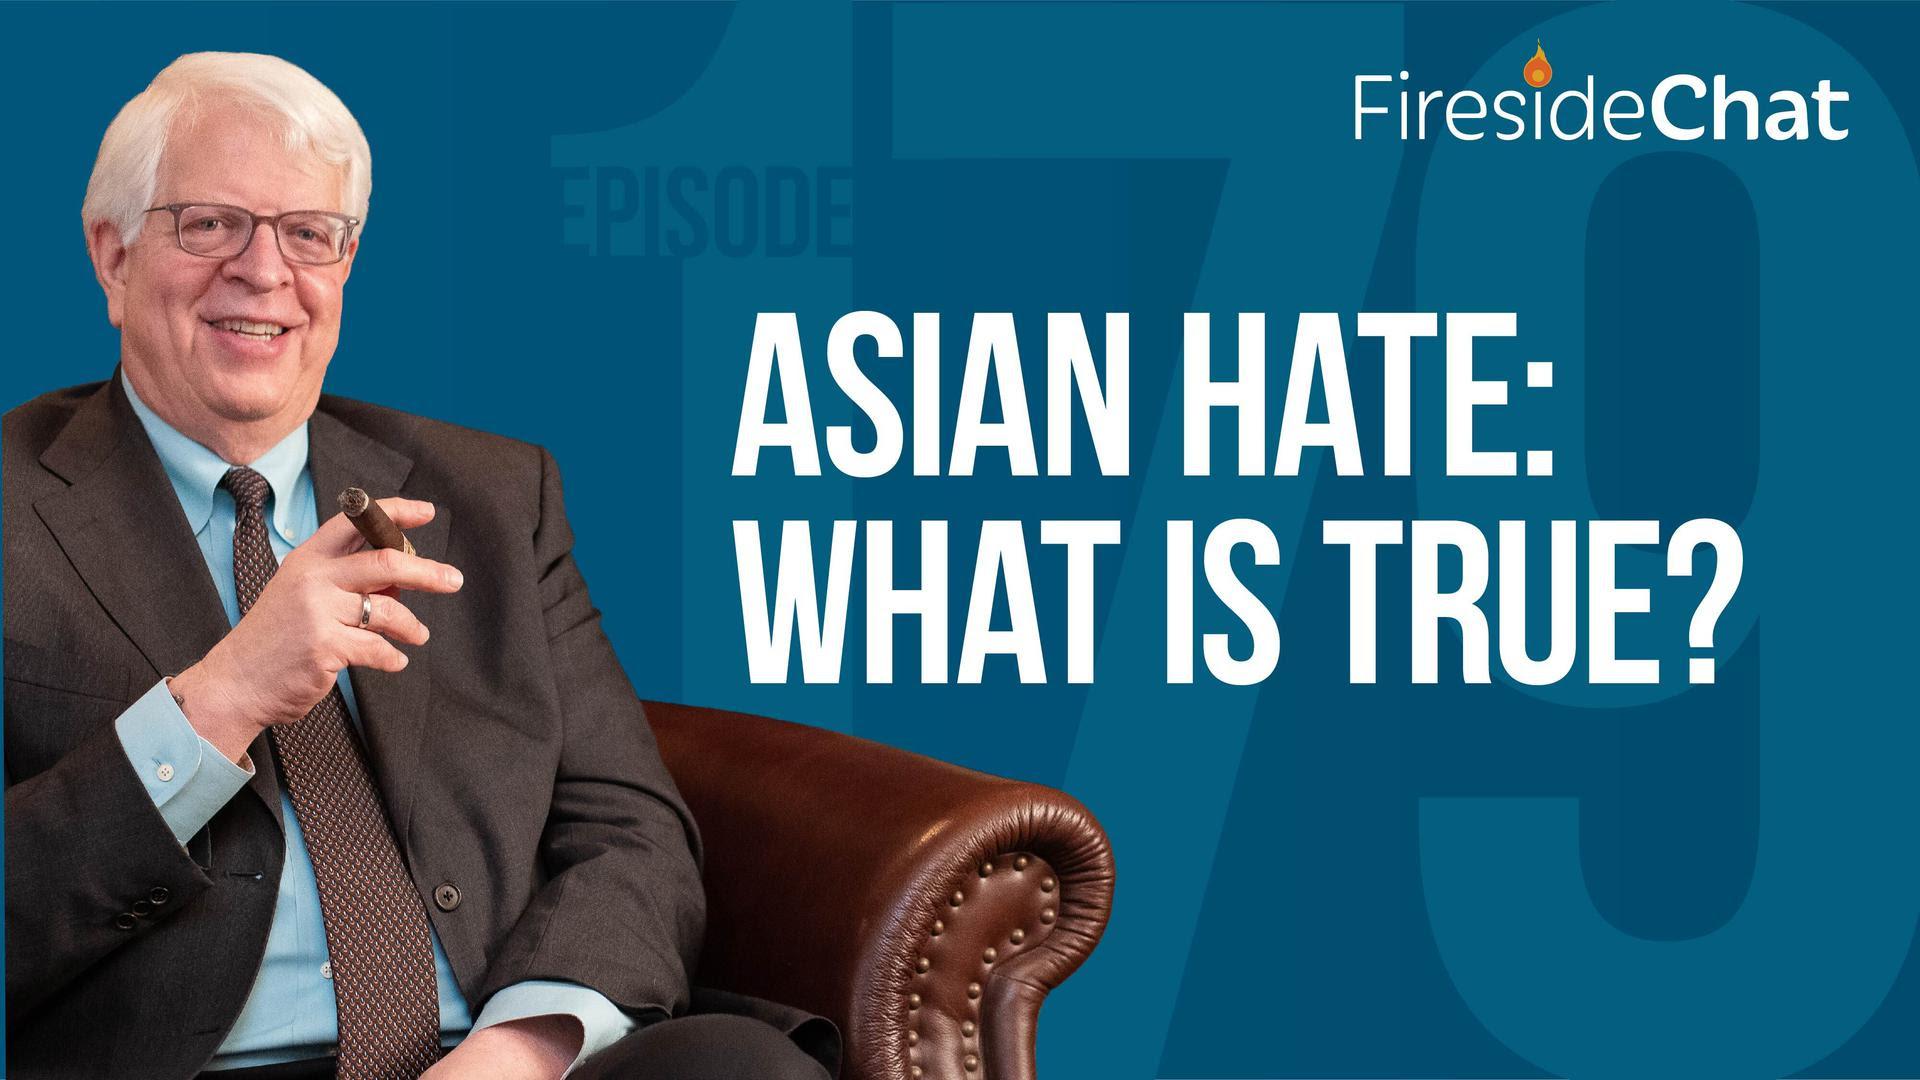 Fireside Chat 179